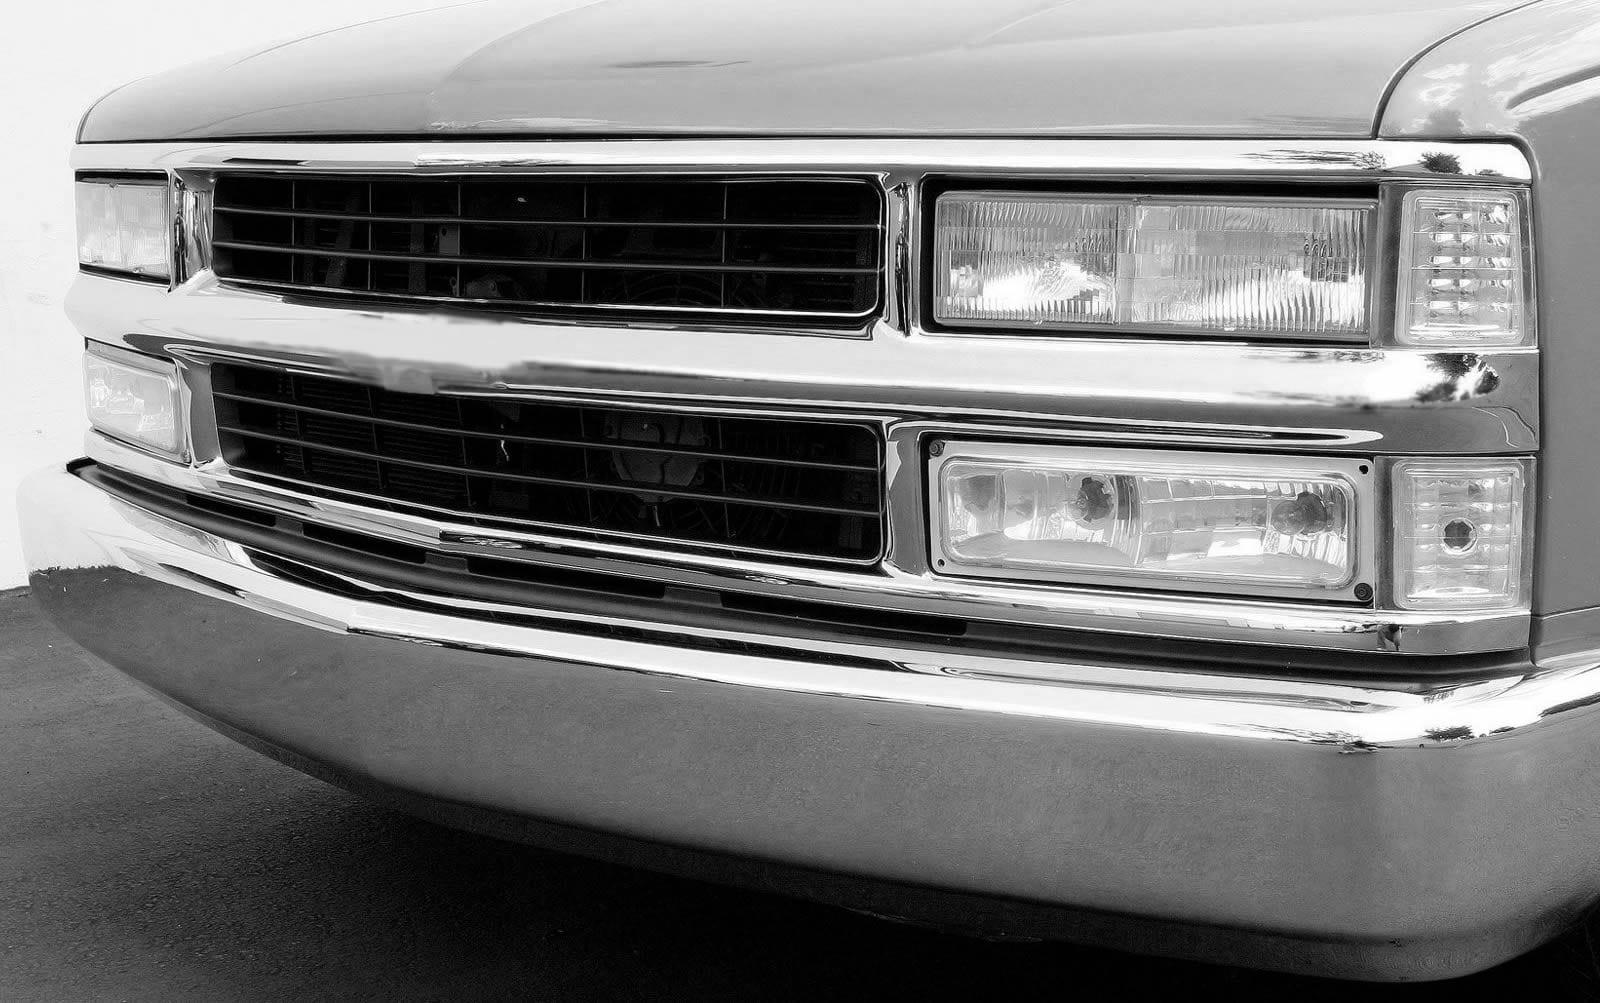 Chevy Pickup Grille on Chevy Silverado Rocker Panel